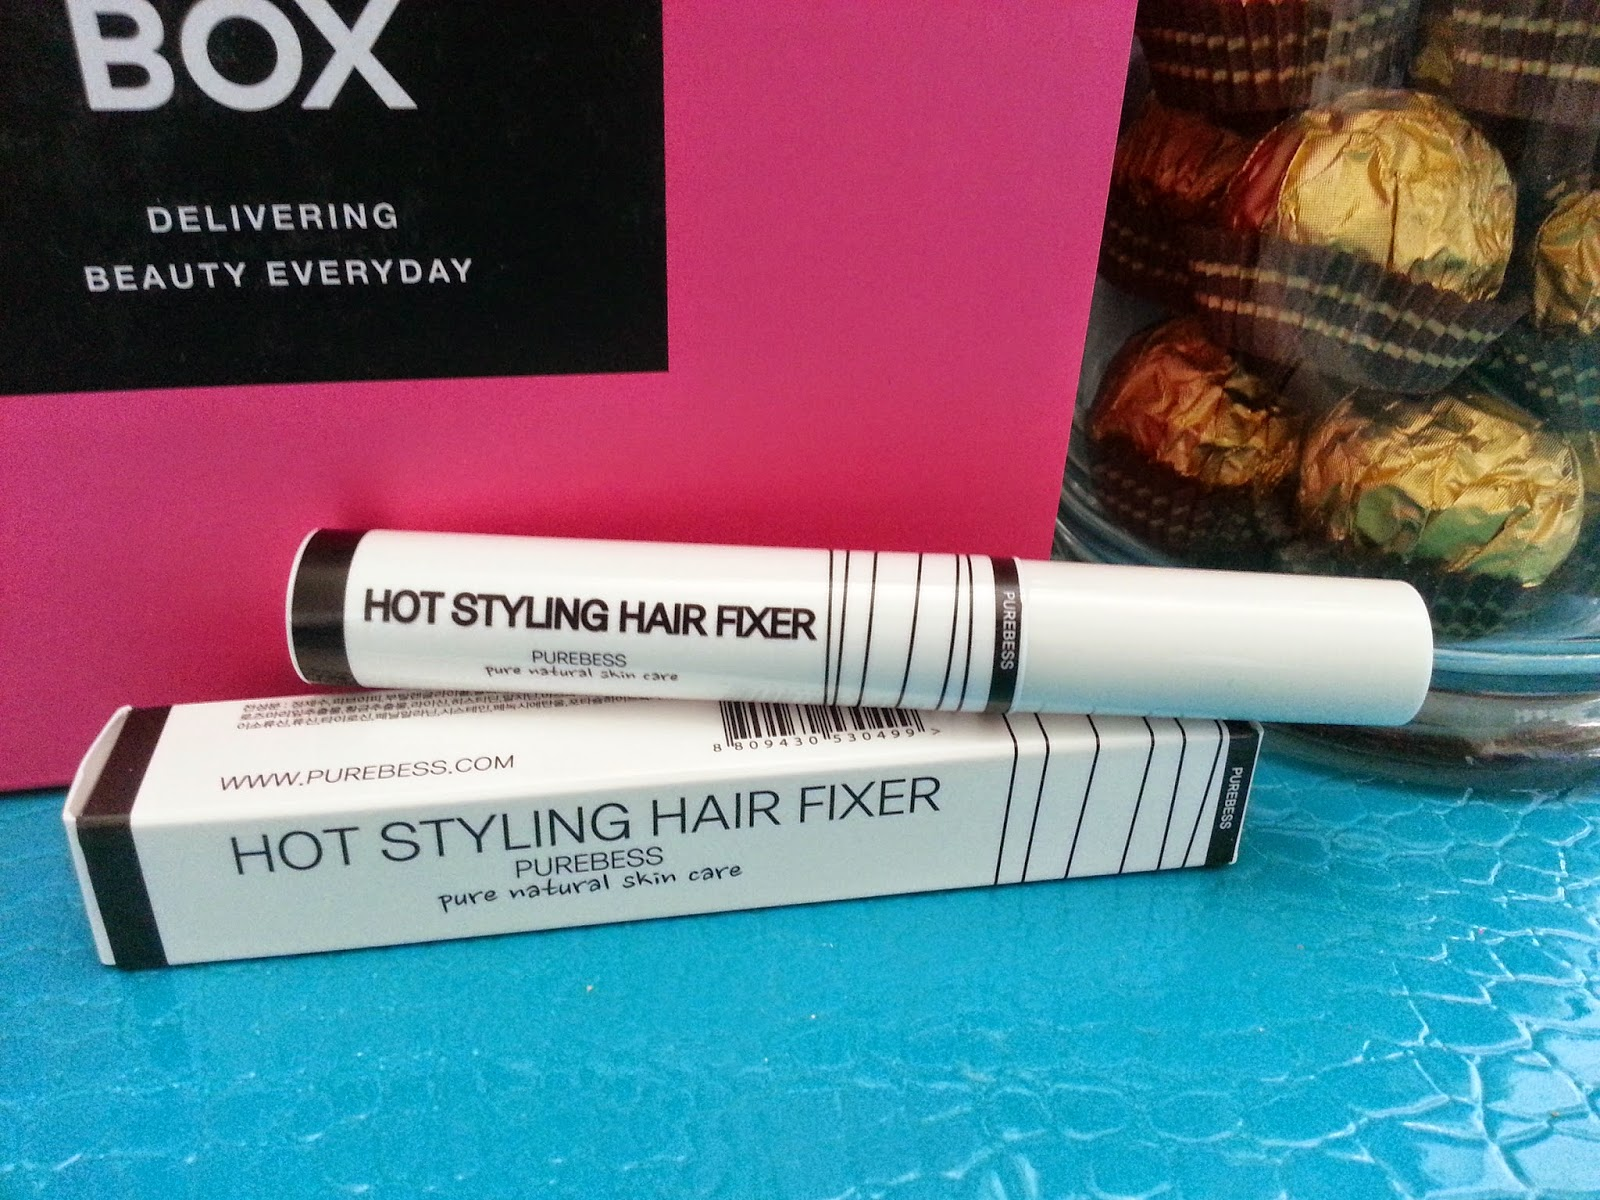 Purebess Hot Styling Hair Fixer